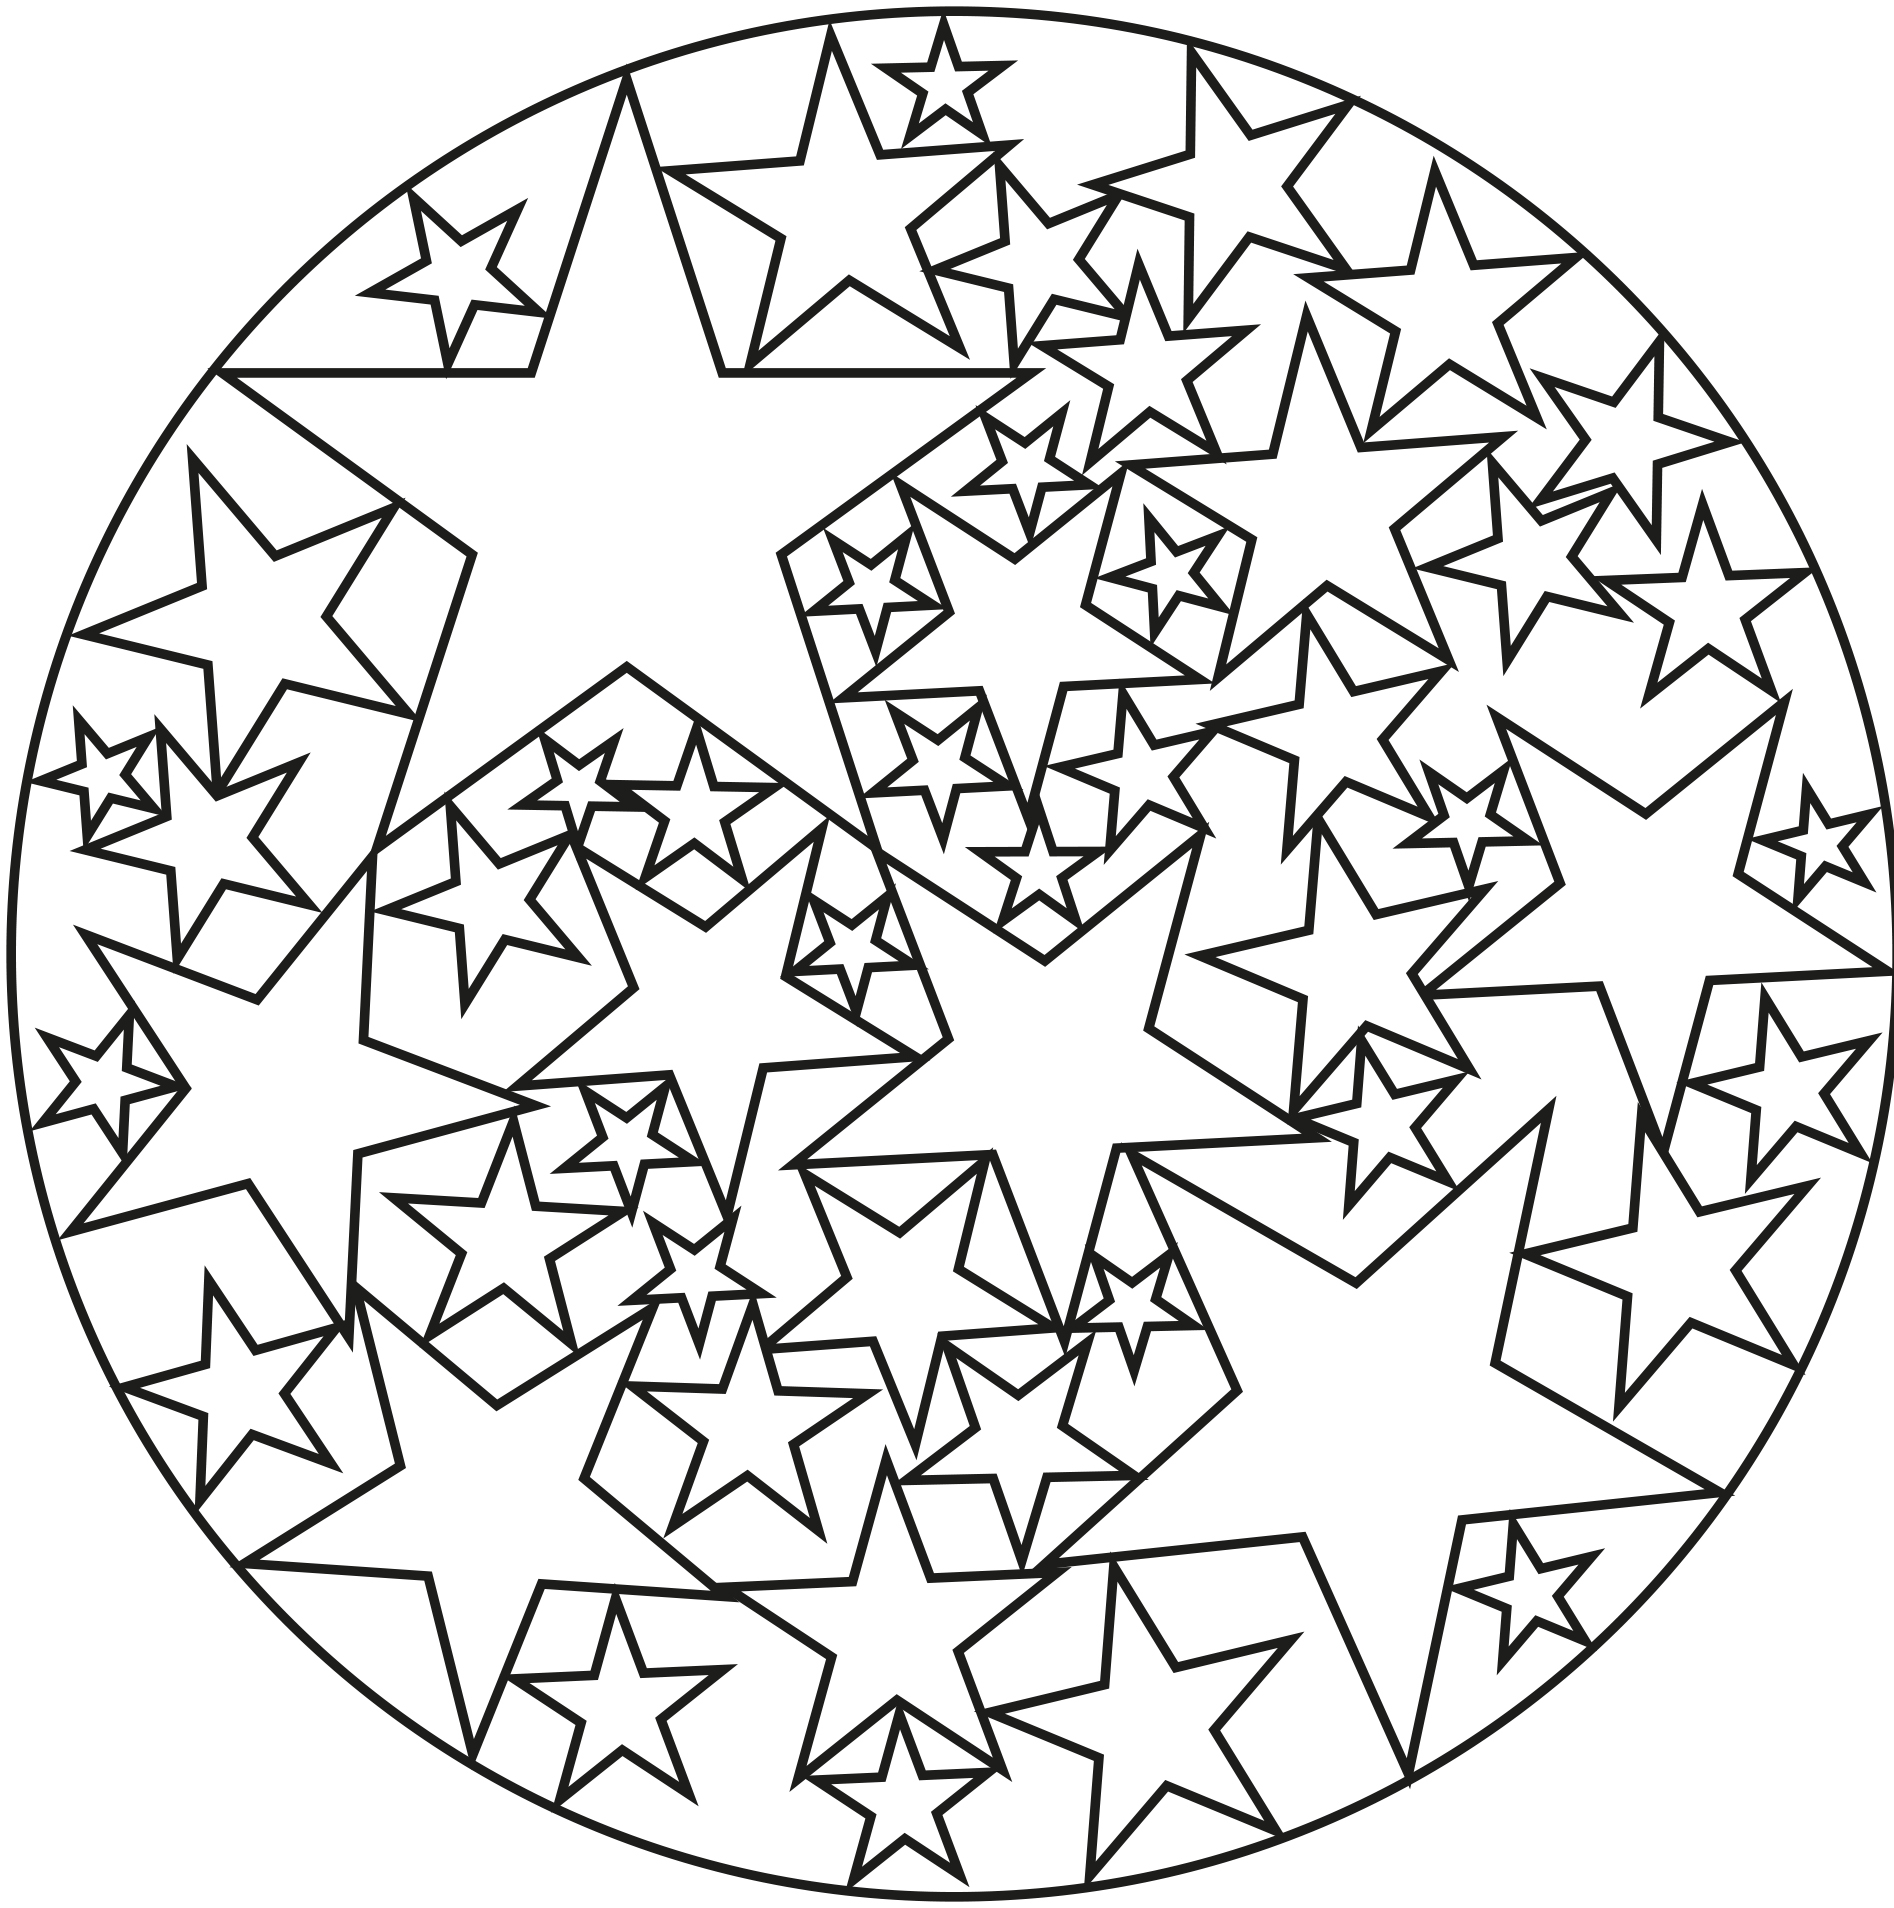 Happy Mandala with stars - Easy Mandalas for kids - 100% ...